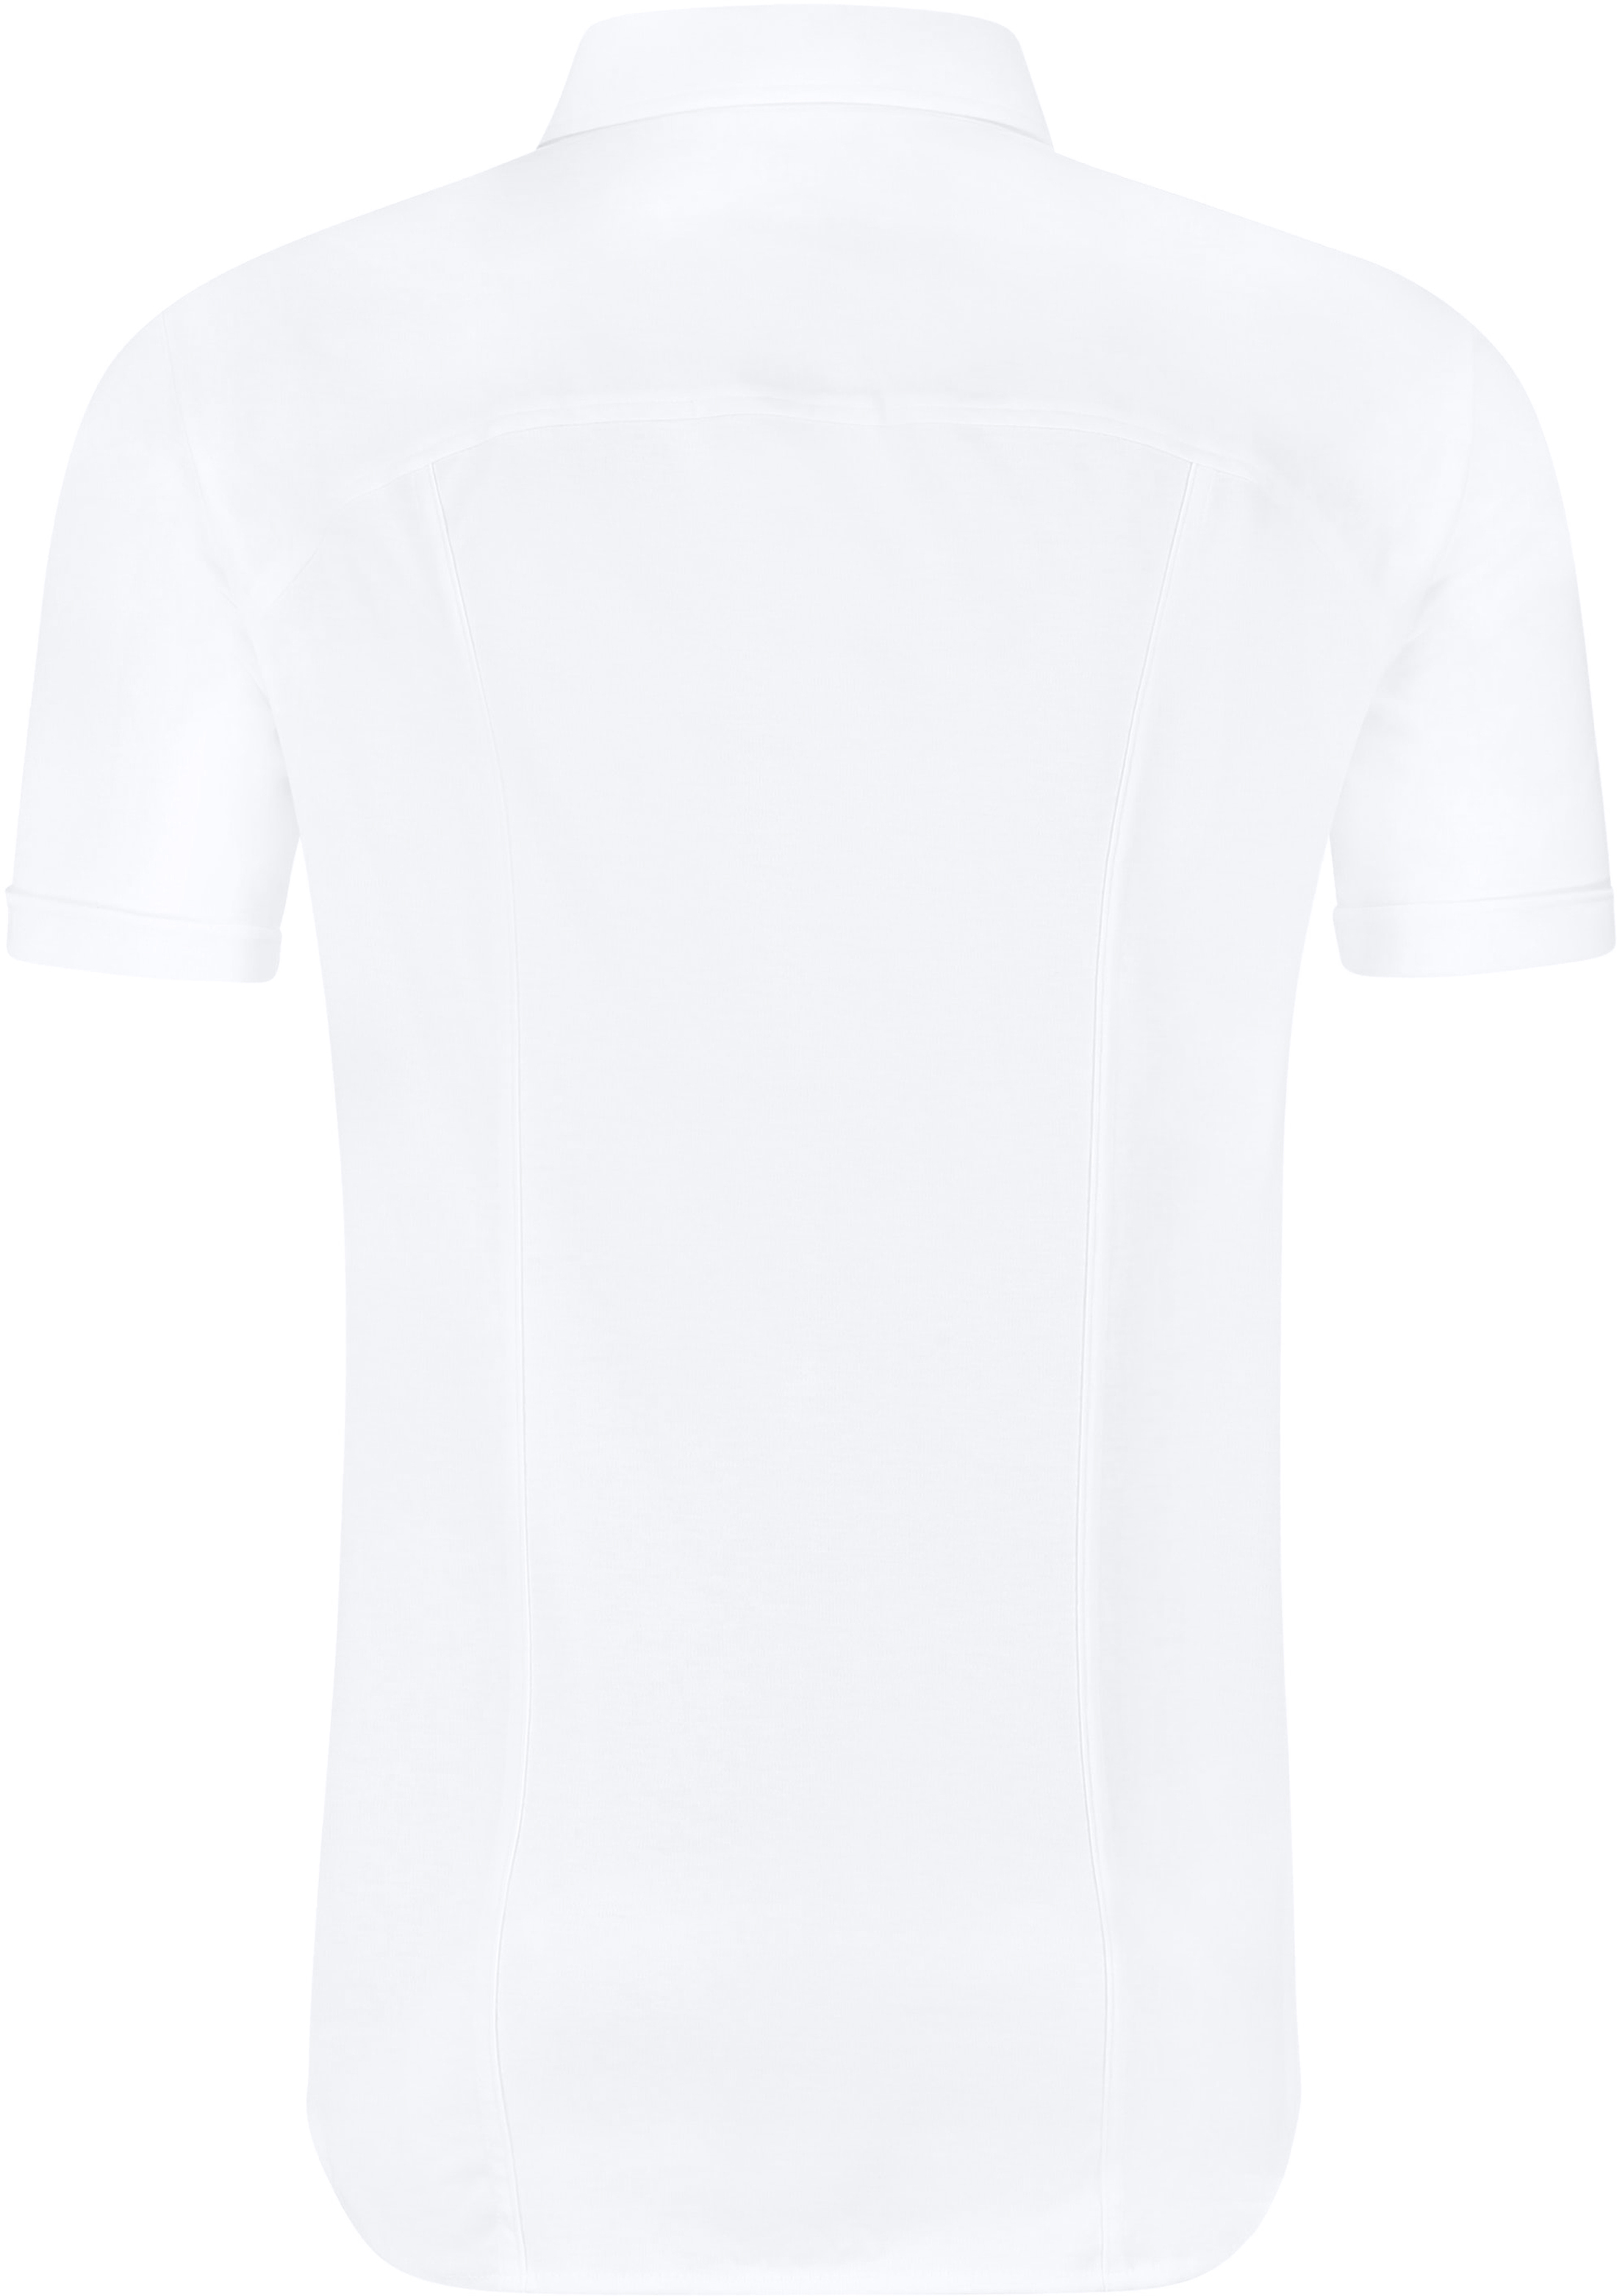 Desoto Overhemd Korte Mouw Wit foto 2